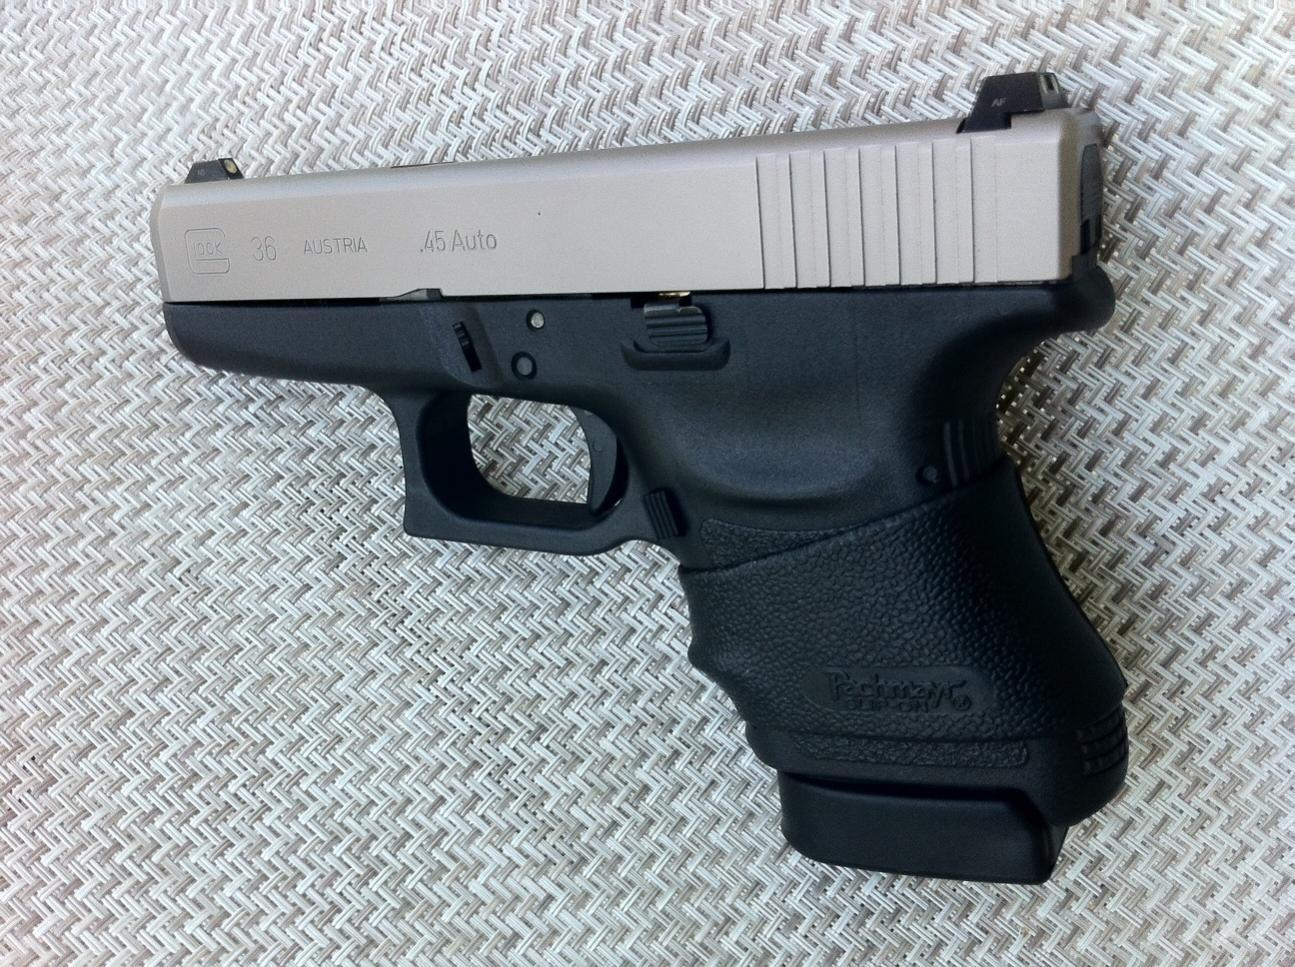 why won't Glock make a single stack sub-compact?-image.jpg